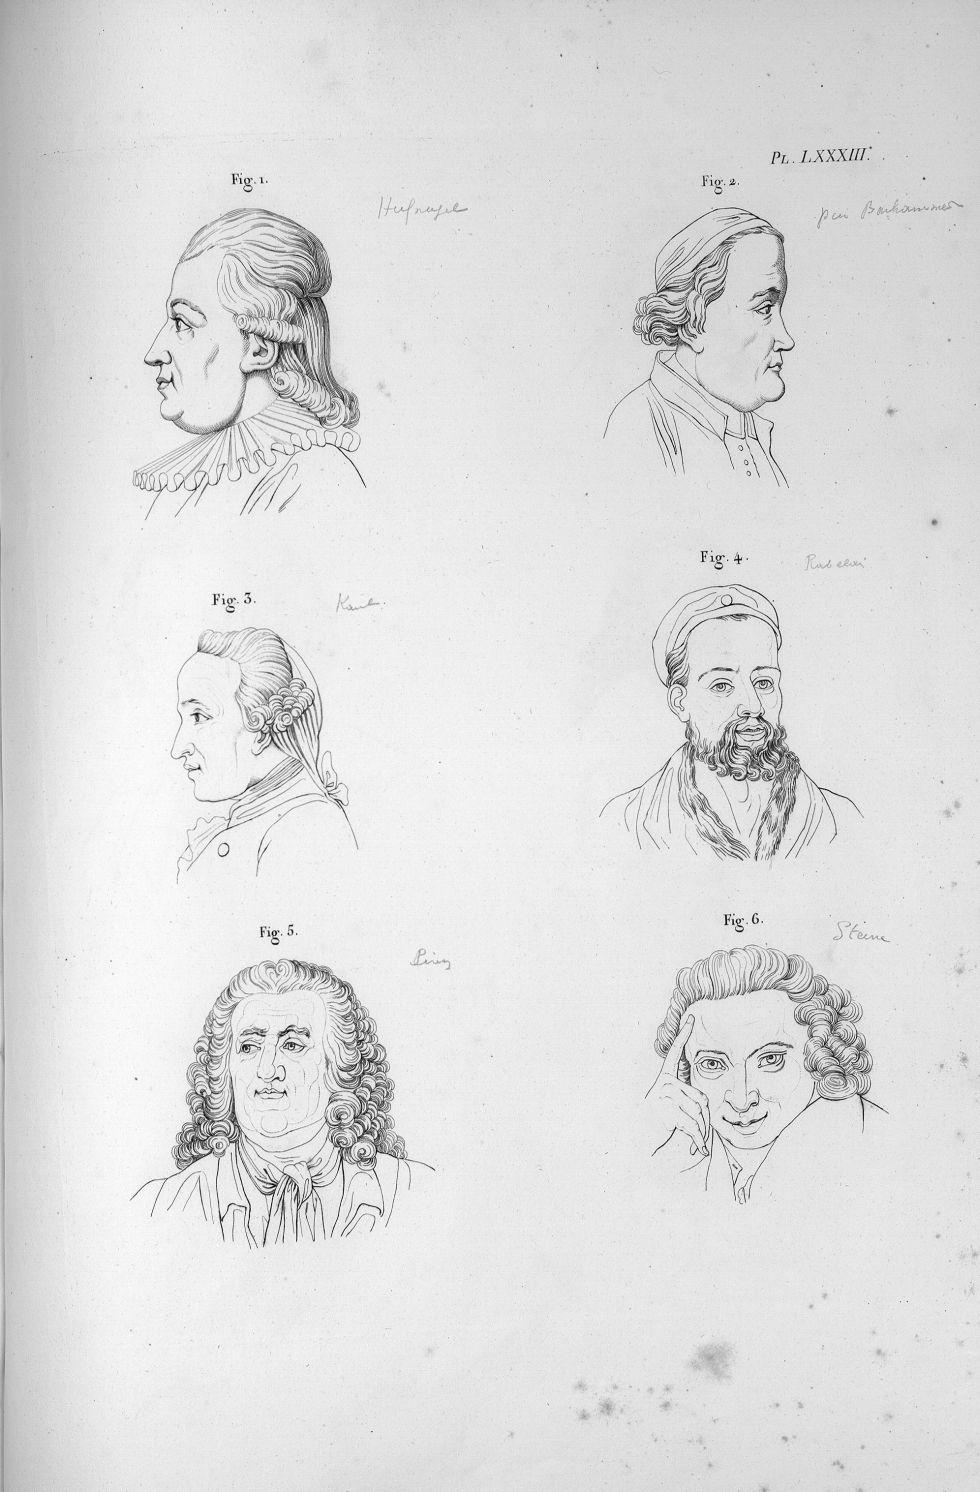 Pl. LXXXIII. Fig. 1. Hufnagel / Fig. 2. Baarhammer / Fig. 3. Kant / Fig. 4. Rabelais / Fig. 5. Piron [...] - Anatomie. Neurologie. Têtes. Phrénologie. 19e siècle (France) - med00575x04x0299